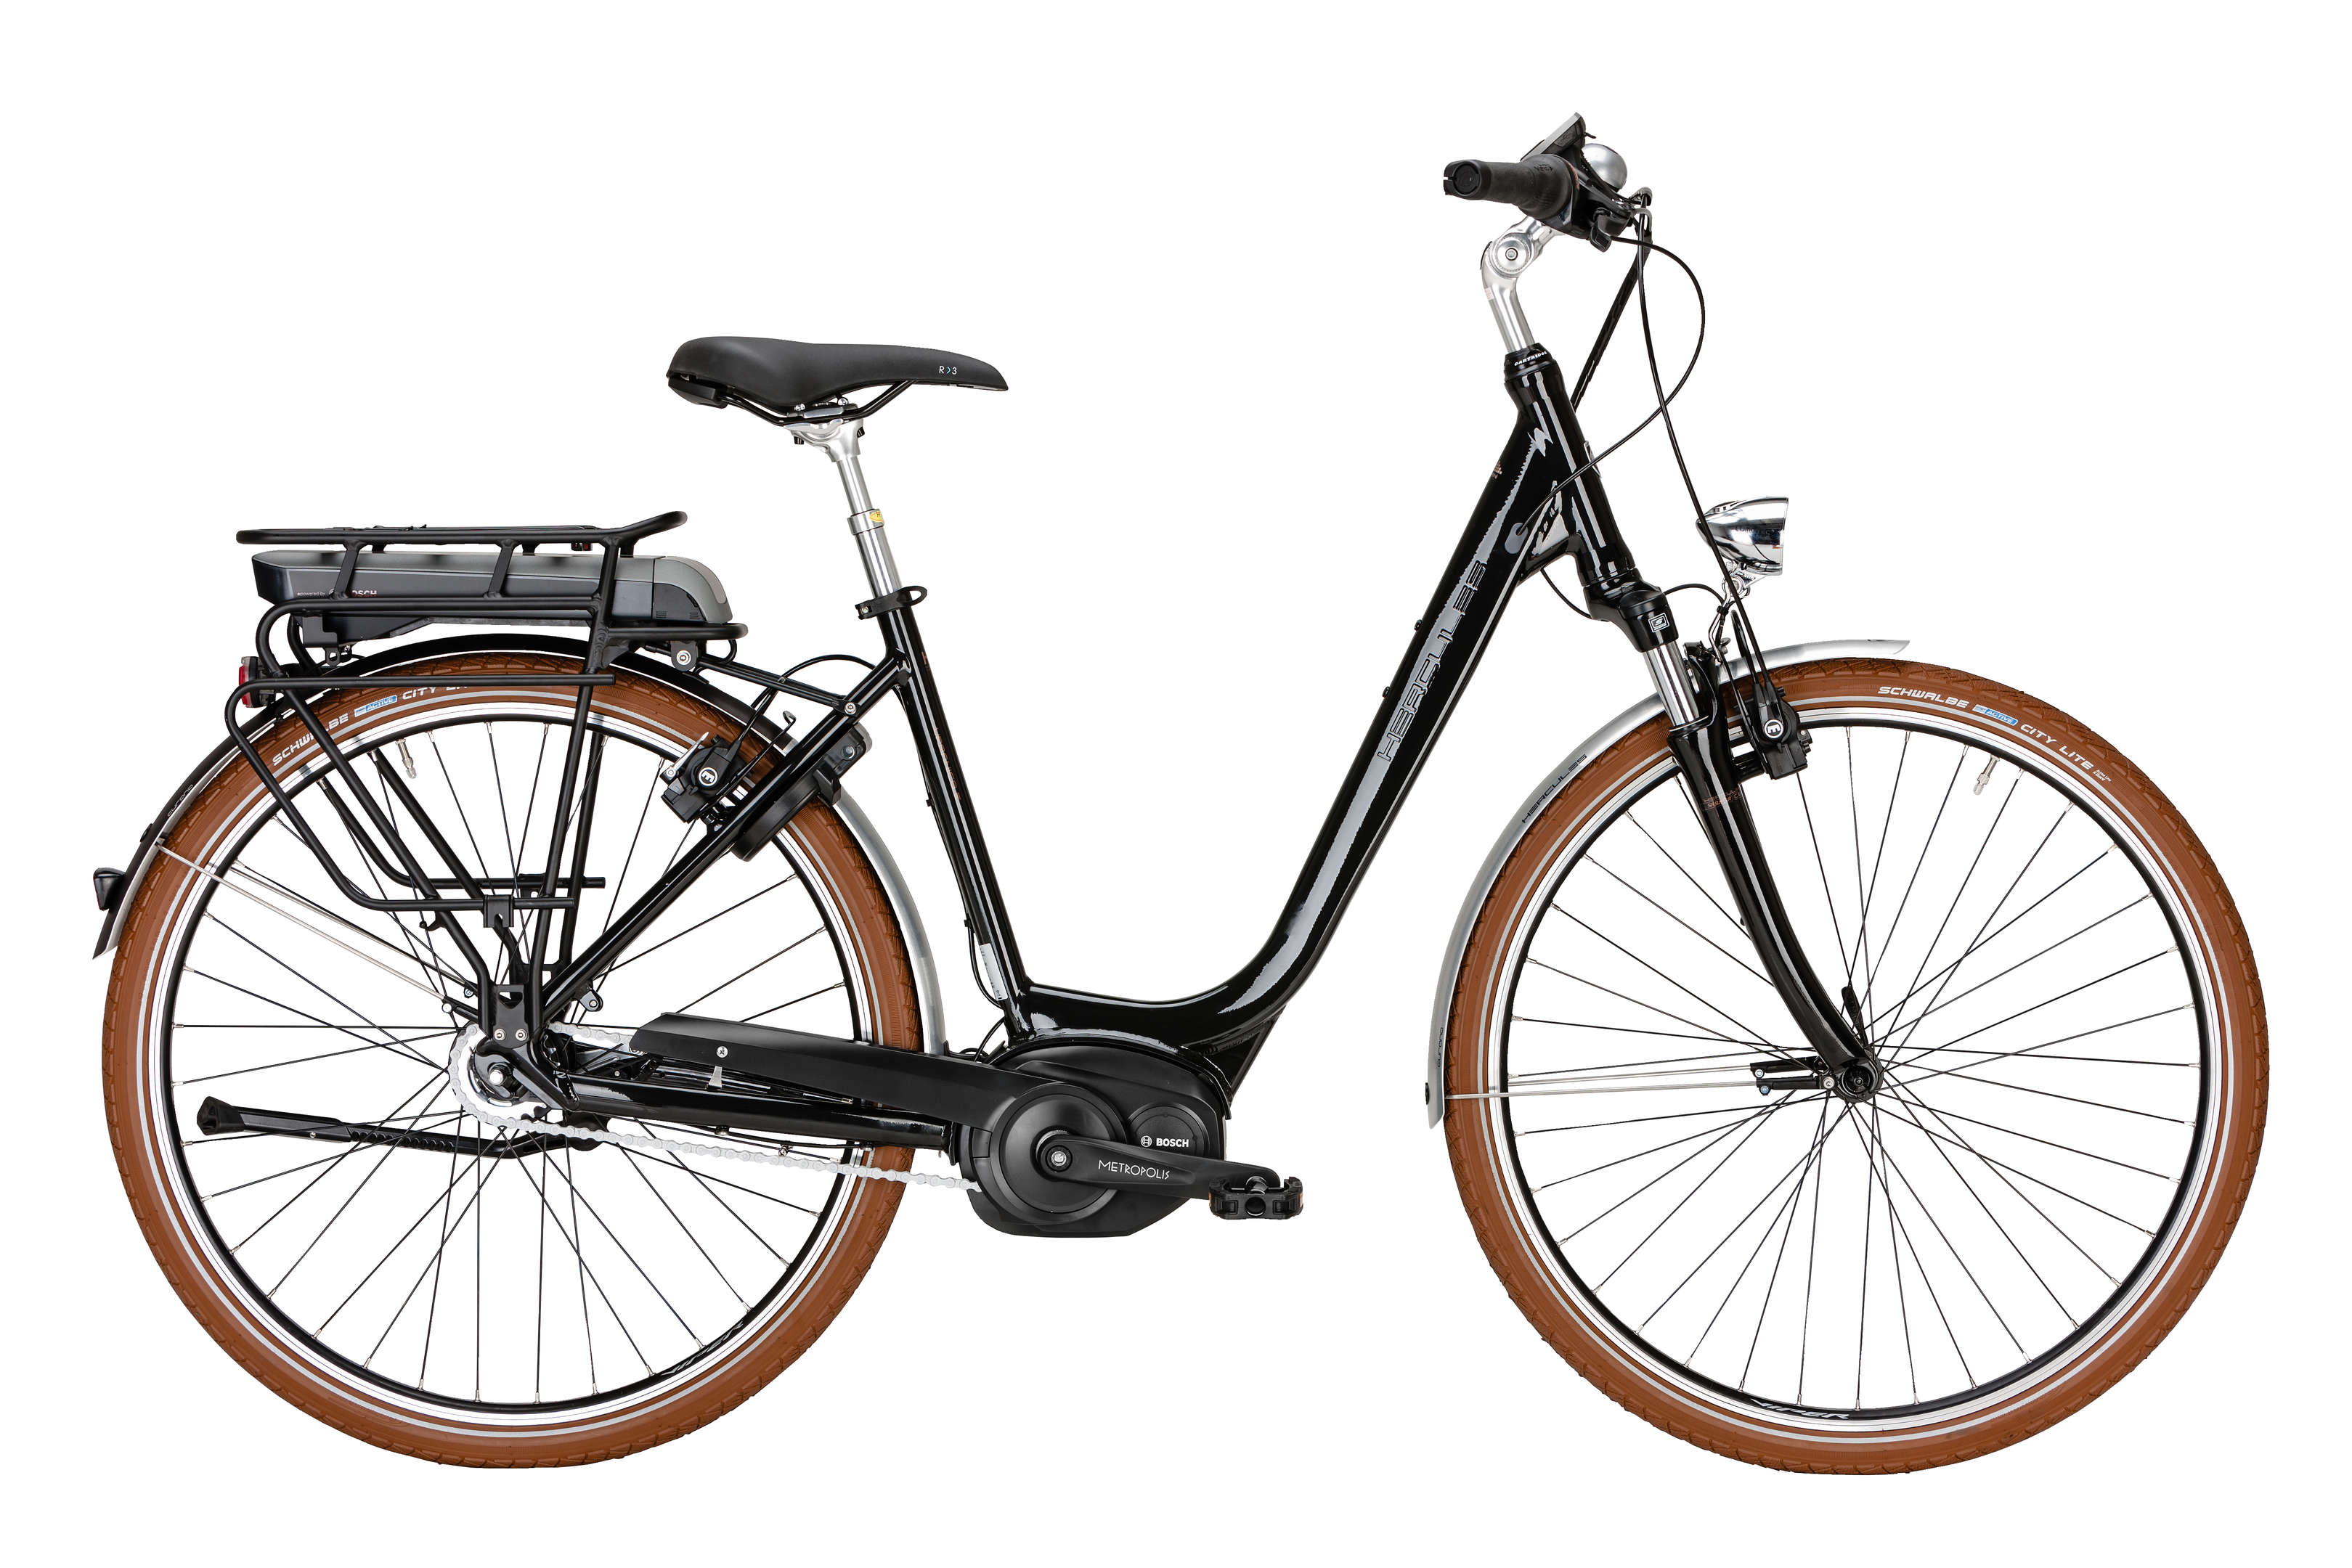 hercules e bike urbanico e r8 eurorad bikeleasingeurorad. Black Bedroom Furniture Sets. Home Design Ideas